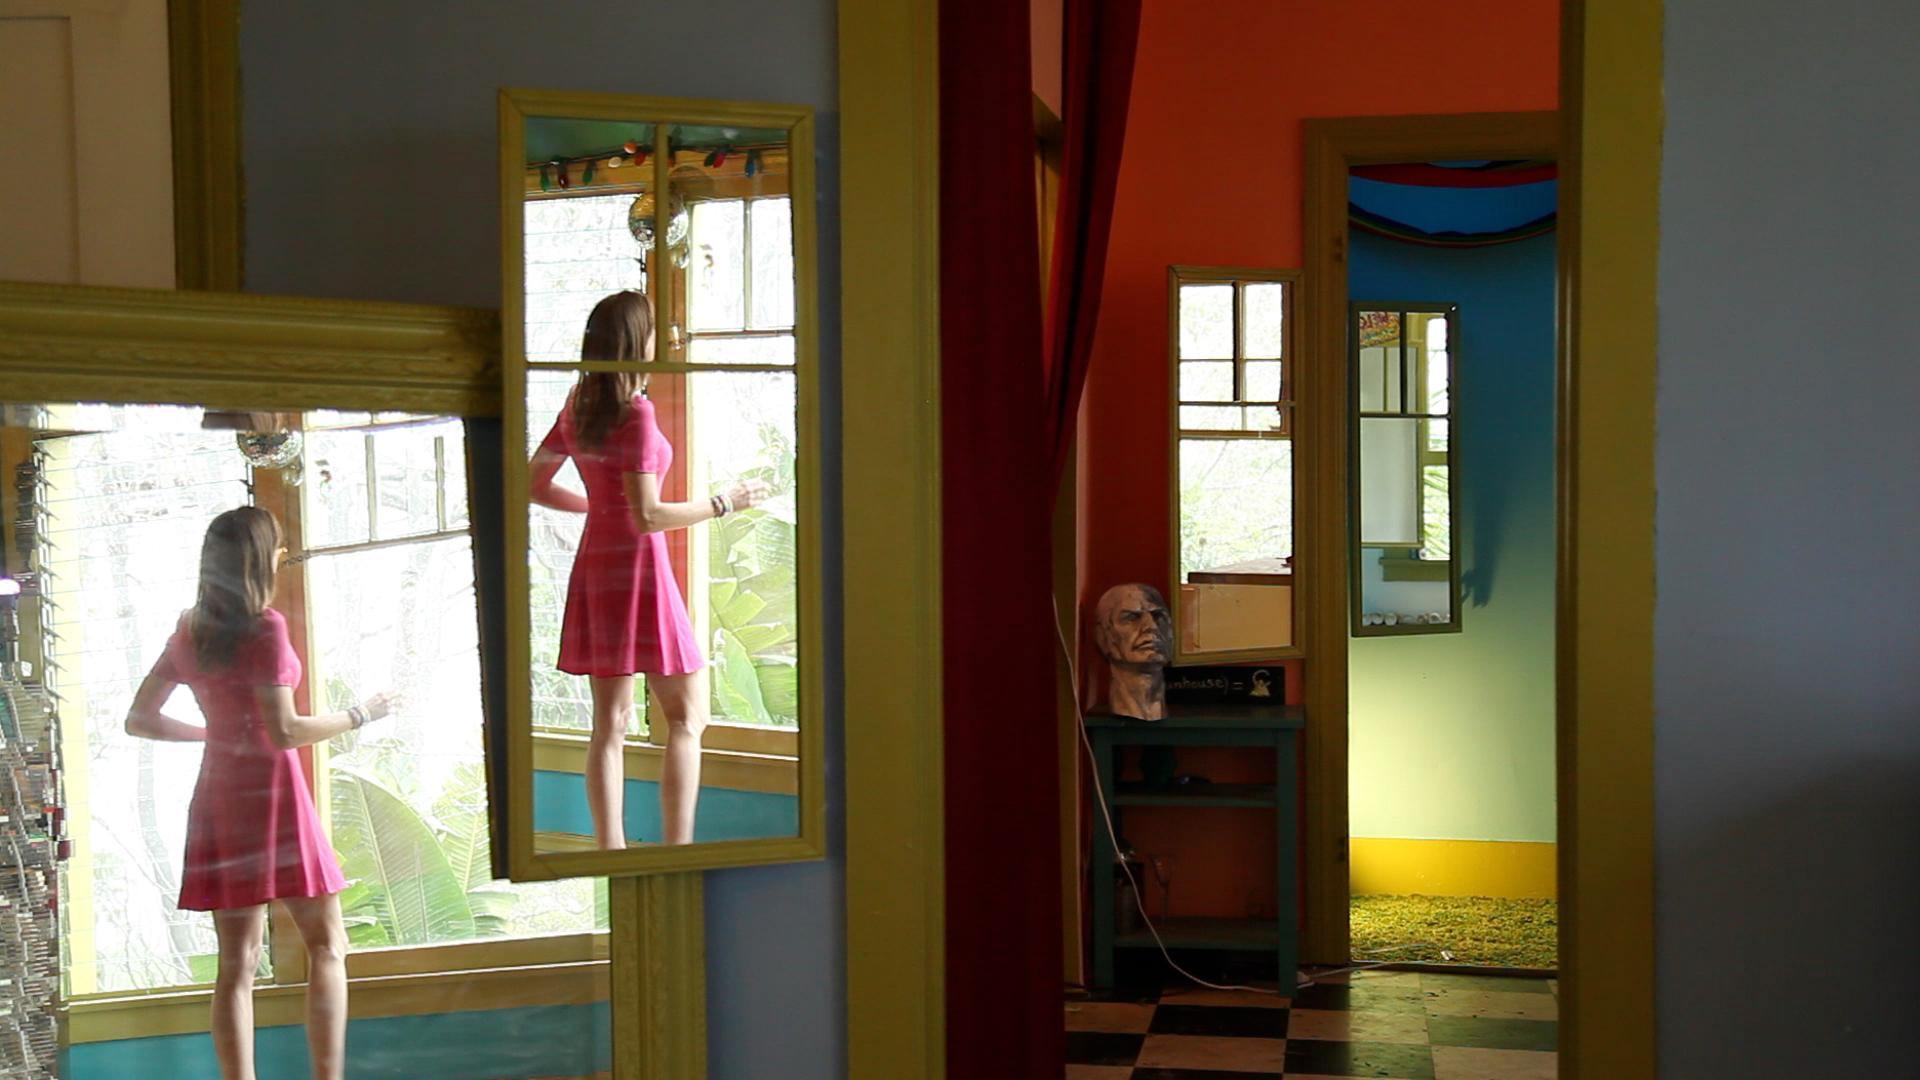 pink dress mirror.jpg